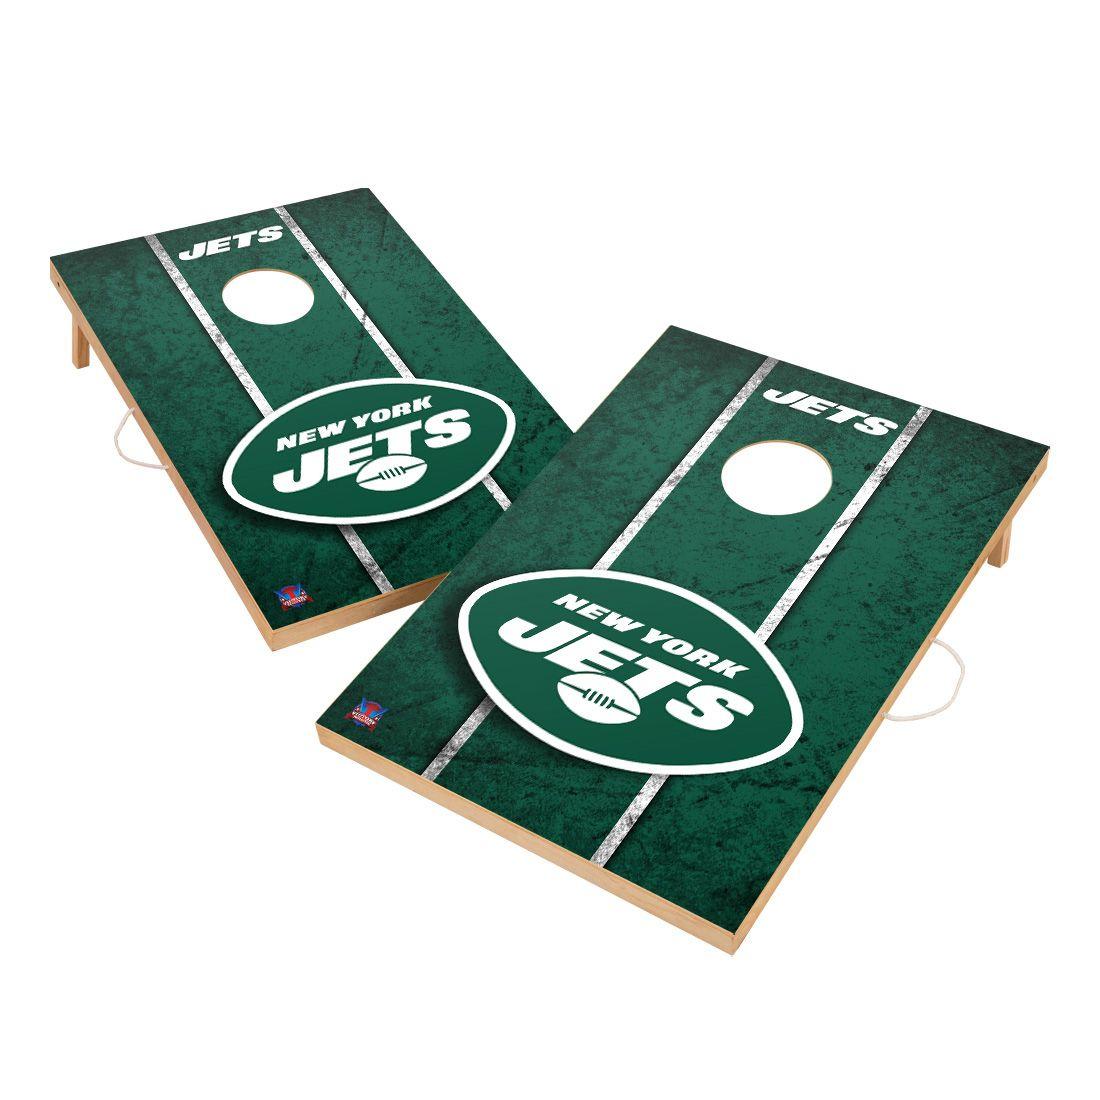 Vintage New York Jets NFL VT - Solid Wood 2x3 Cornhole